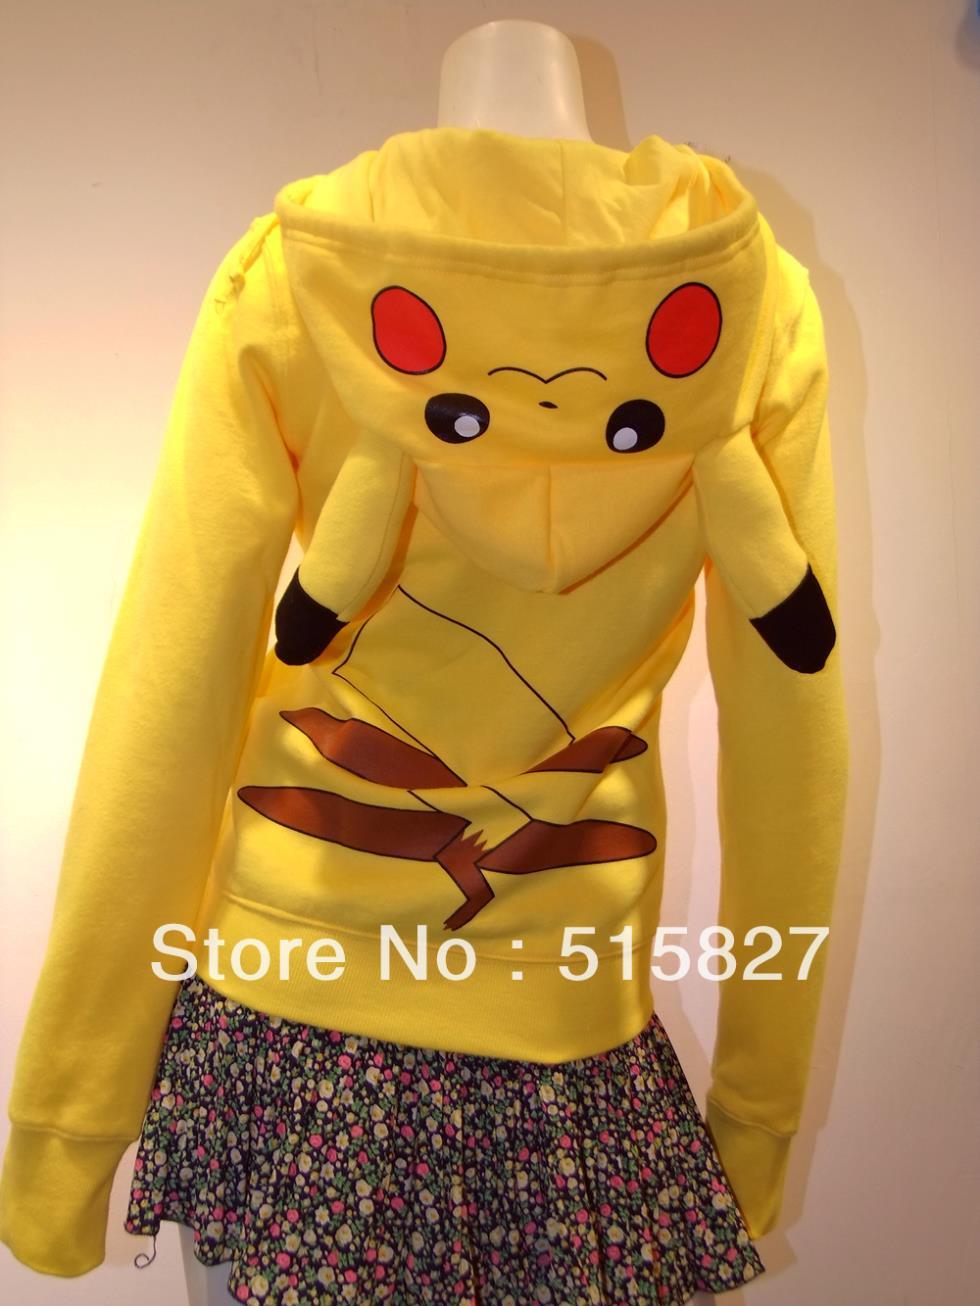 Japan Anime Lady Fashionable Cool Pokemon Pikachu Fashion Casual Hoodie Hoody Cosplay Costume Clothes women - UFO store